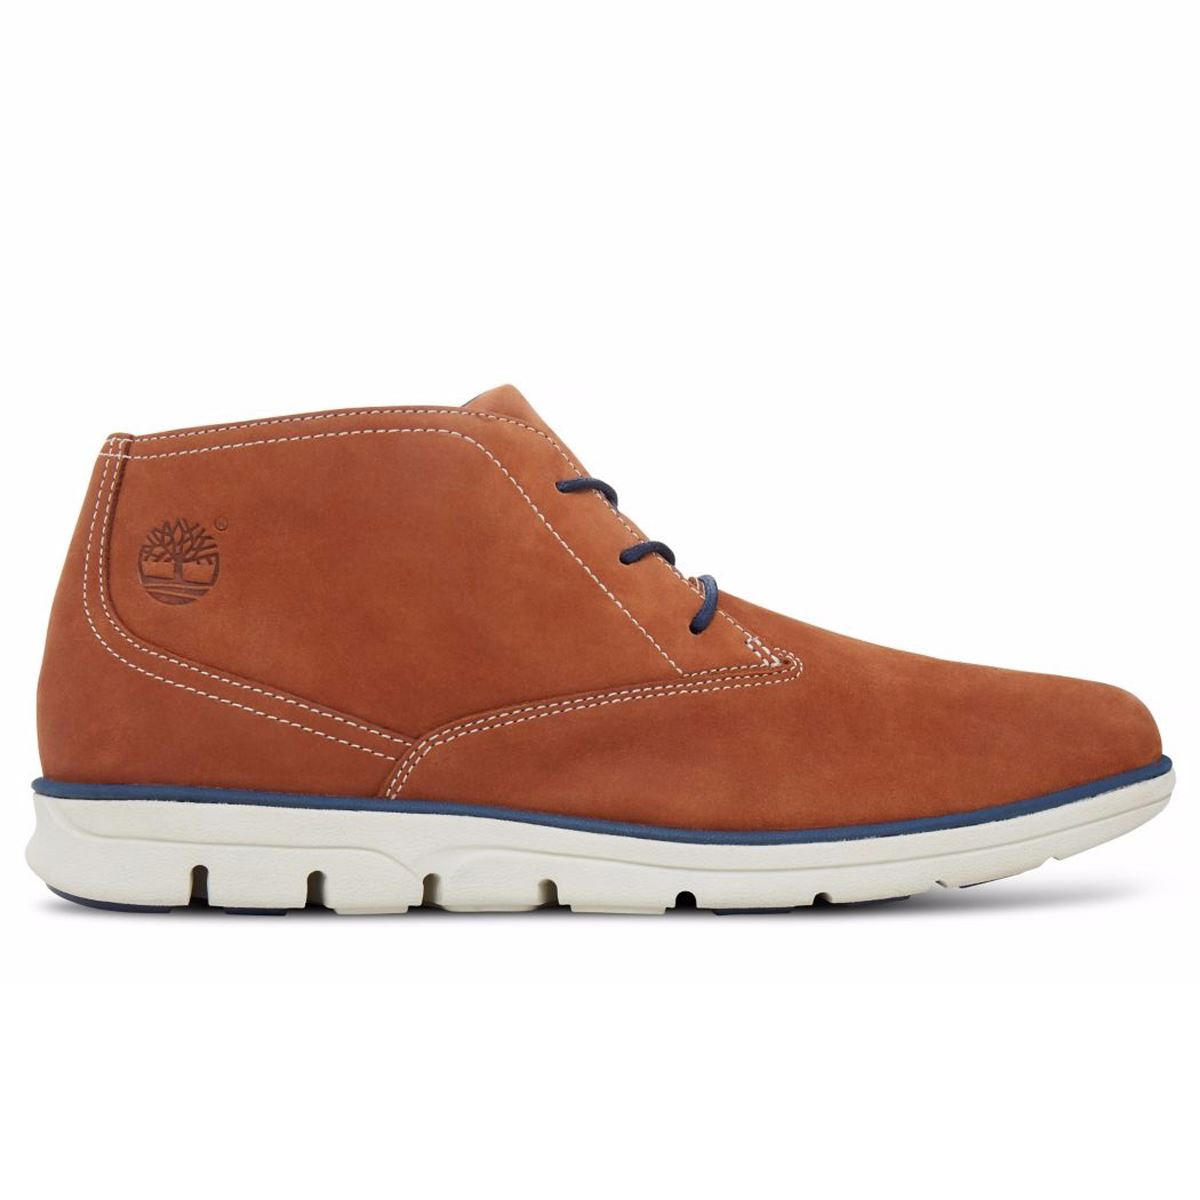 timberland bradstreet plain toe chukka brown mens boots